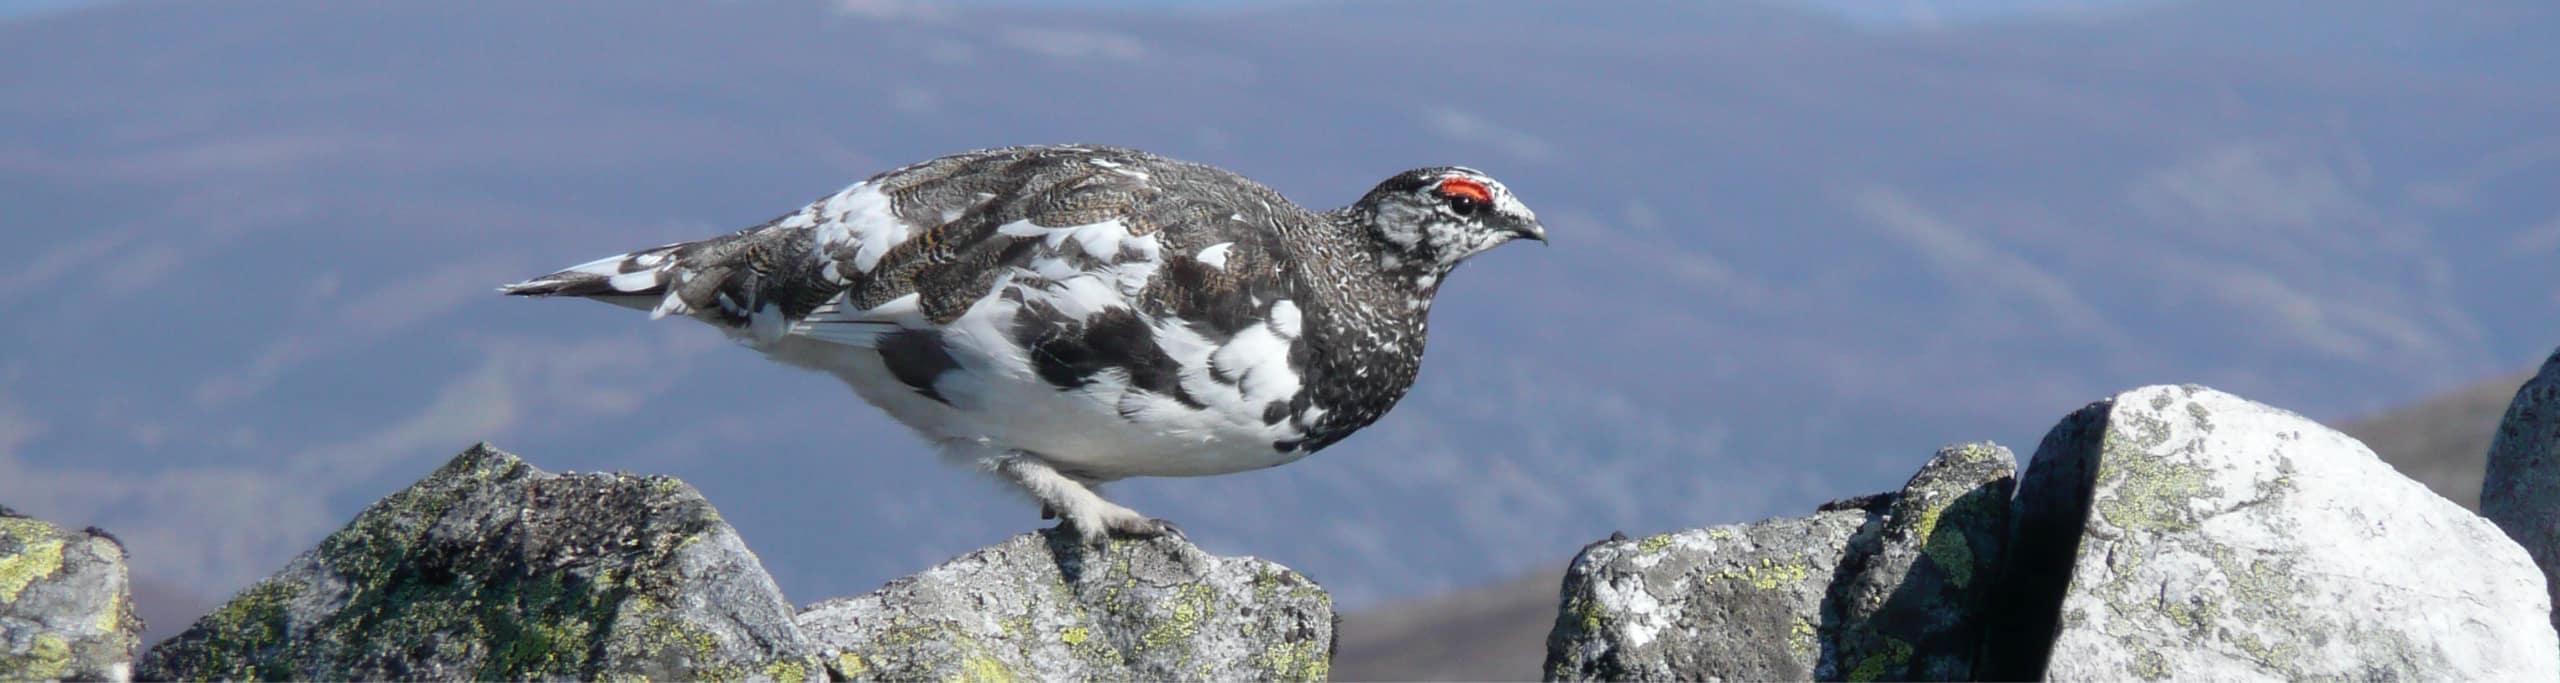 Male ptarmigan in winter plumage in Glenisla